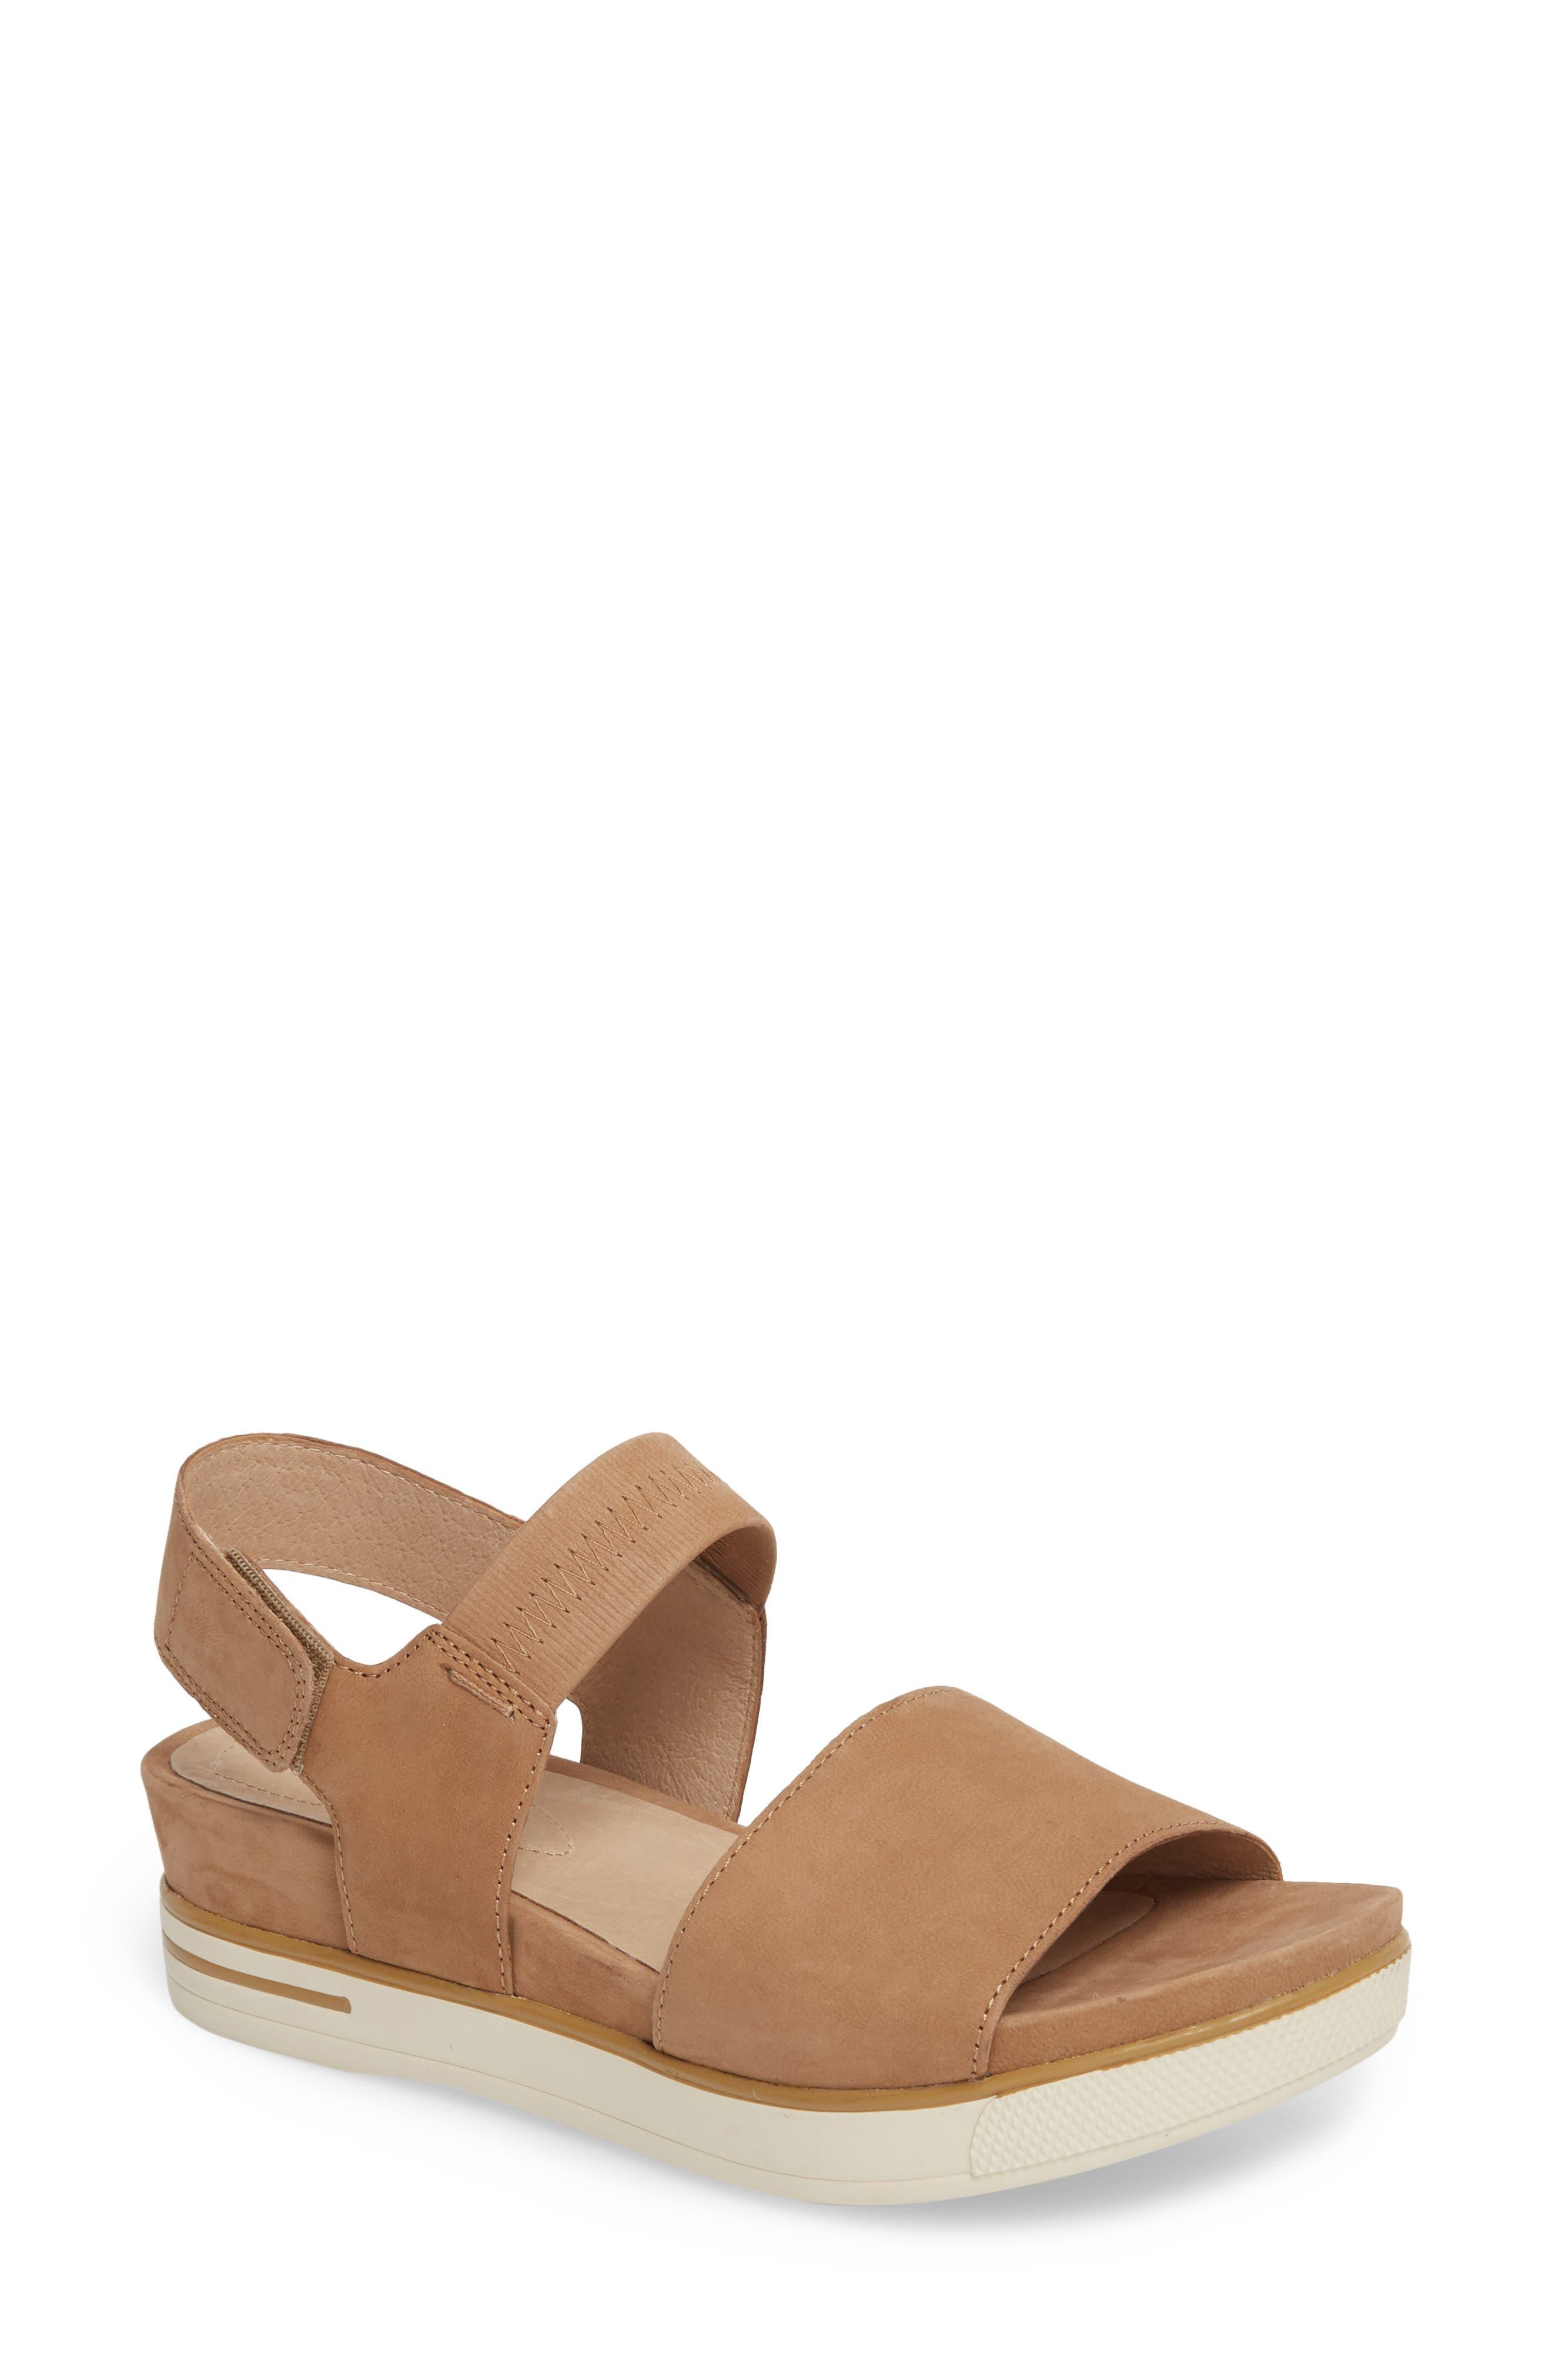 Somer Sandal,                         Main,                         color, Wheat Nubuck